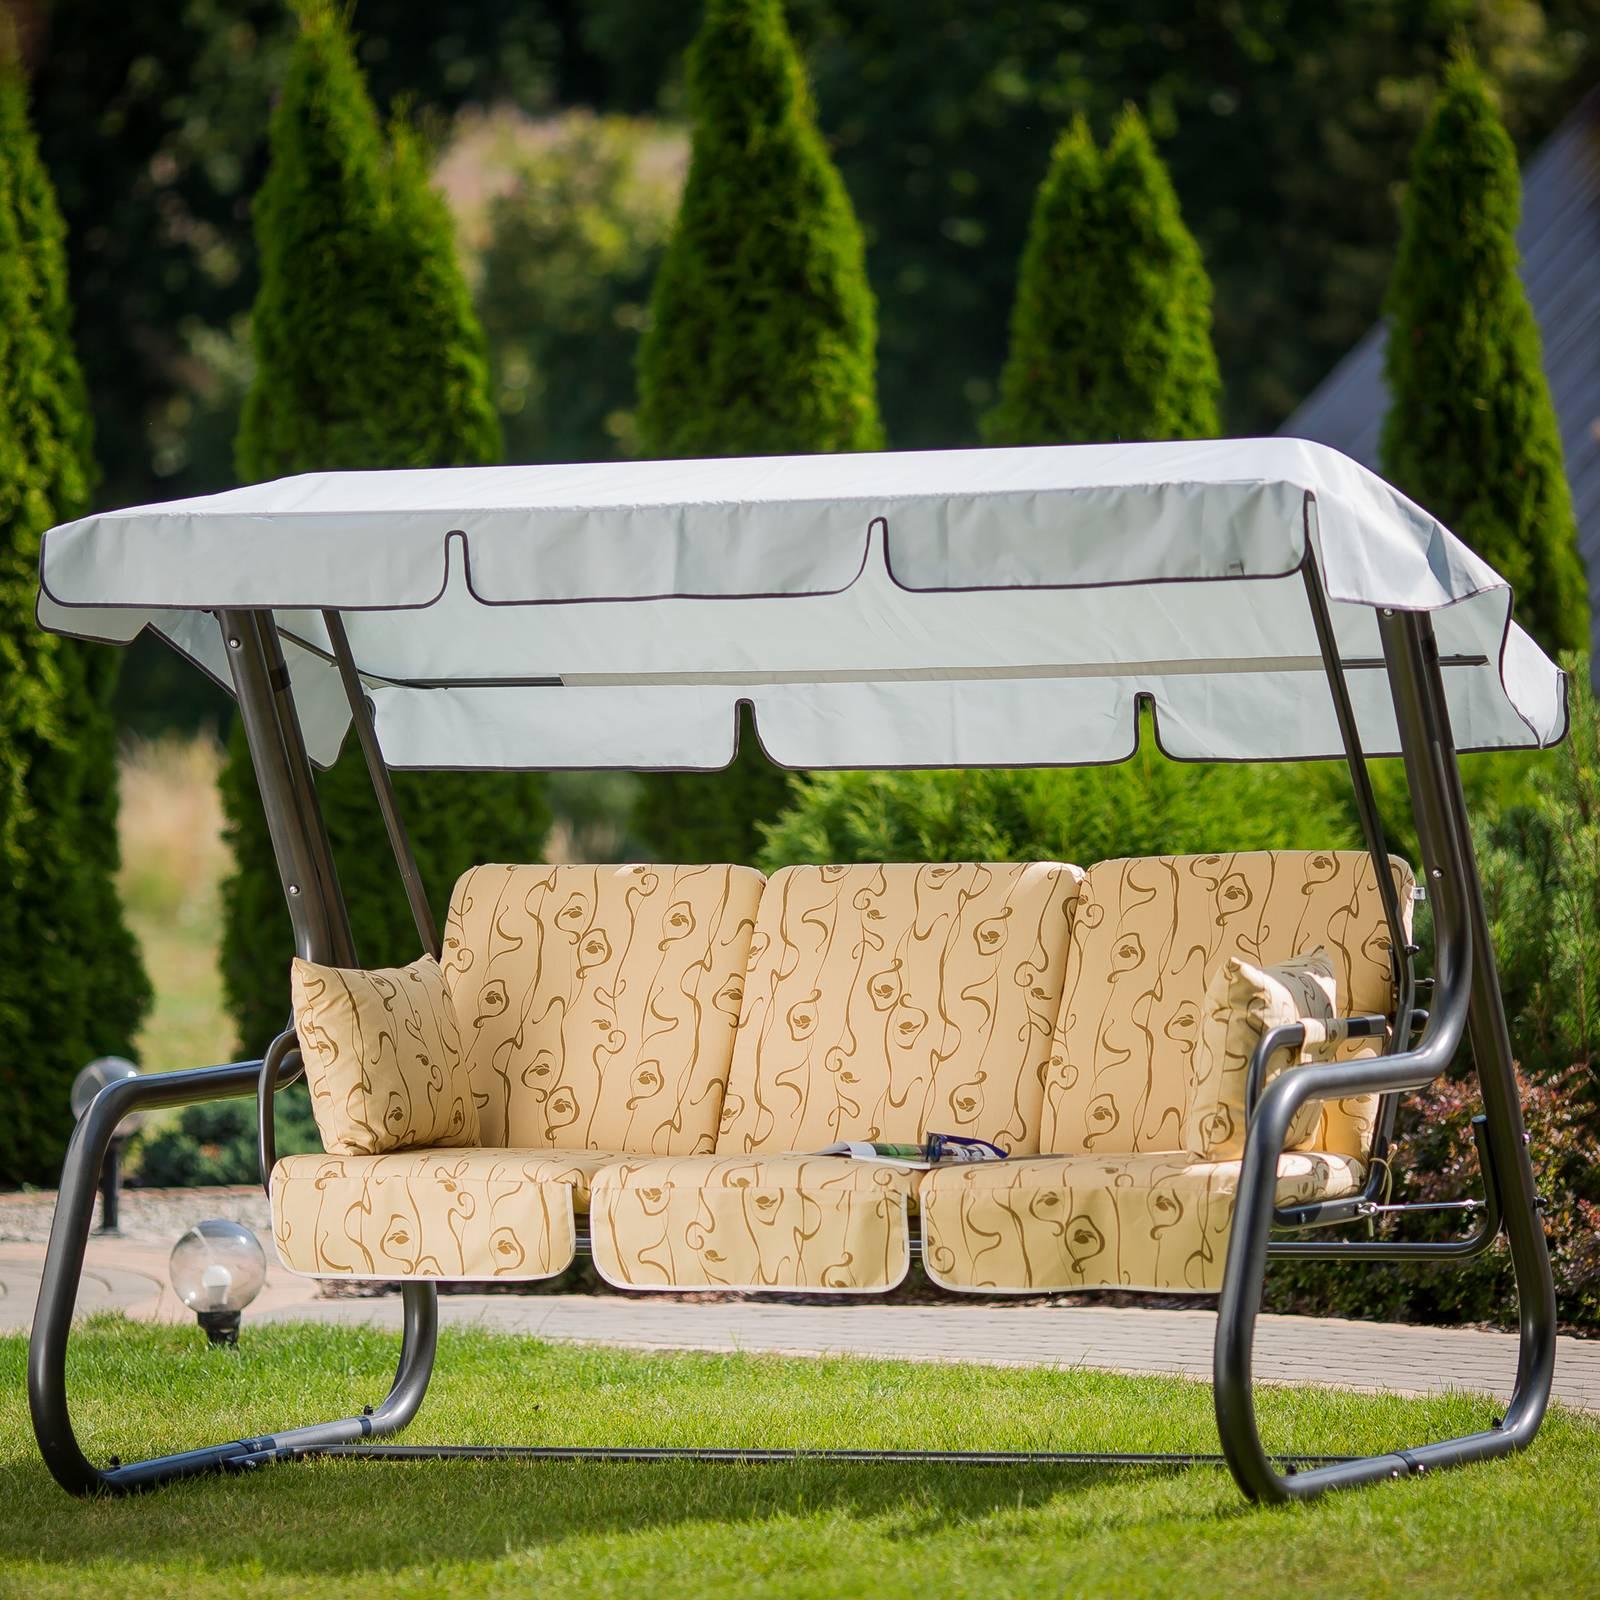 Poduszki na huśtawkę 180 cm Rimini / Venezia G009-05HW PATIO